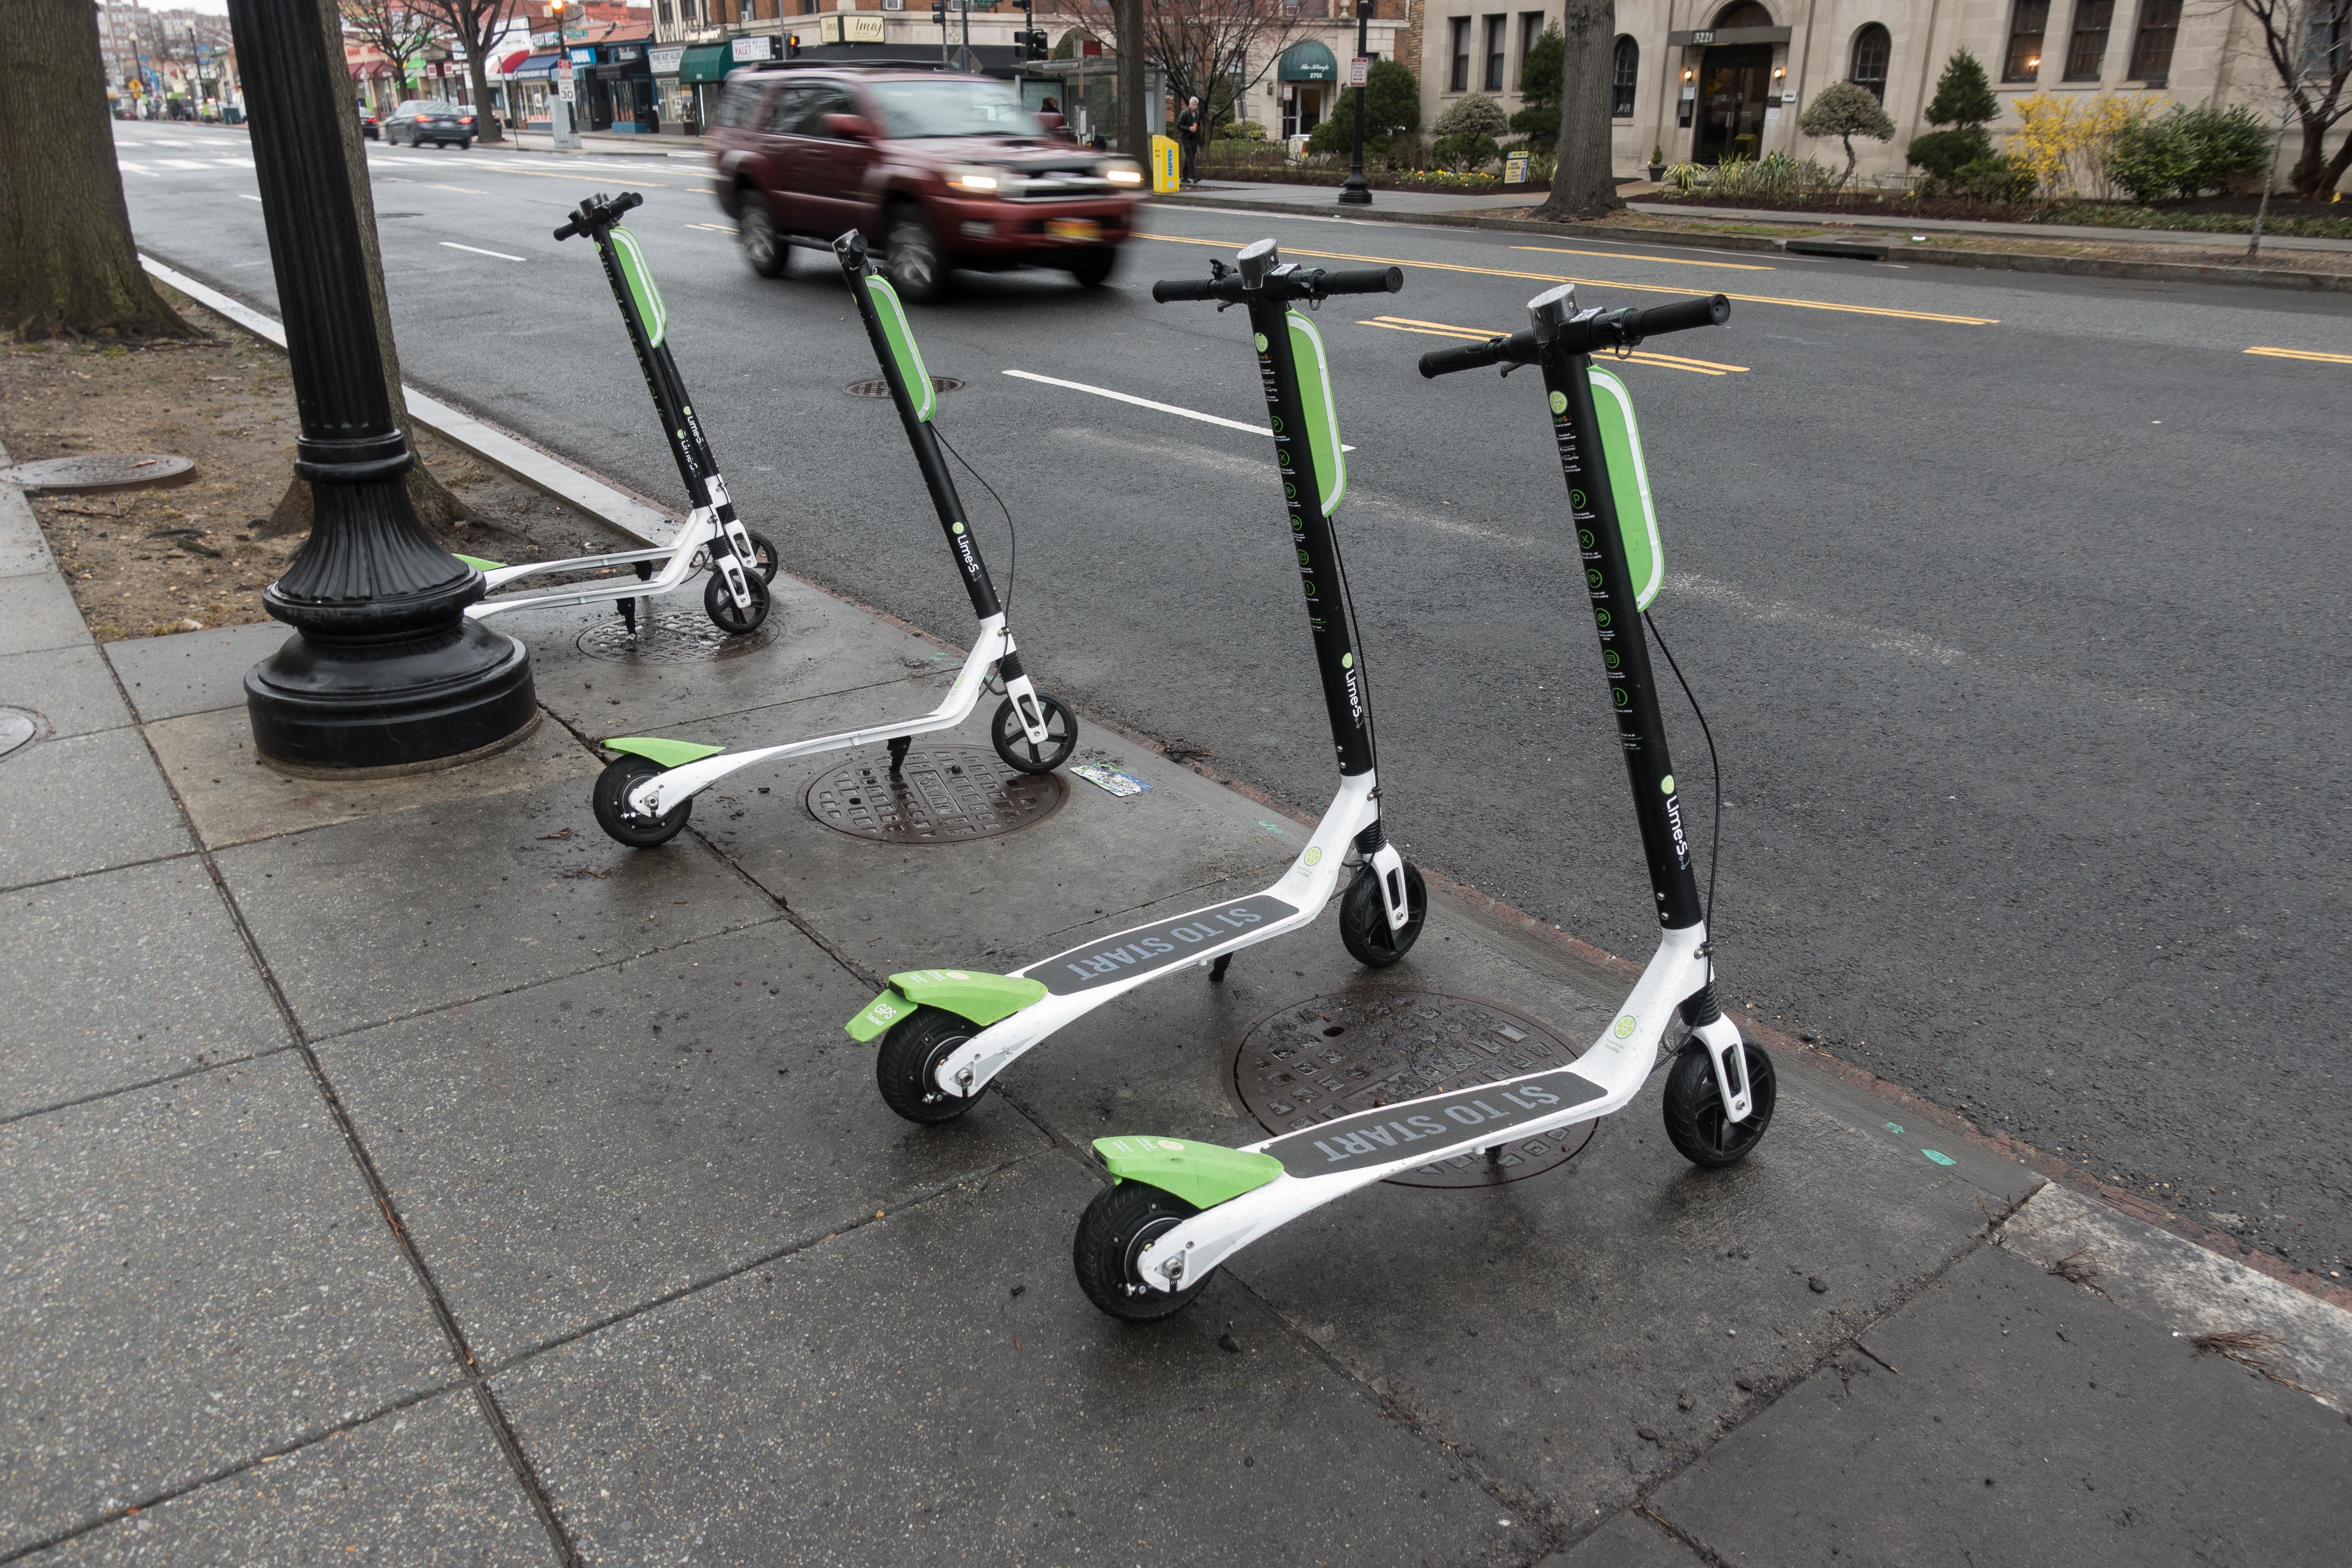 LimeBike scooters in Washington, D.C.